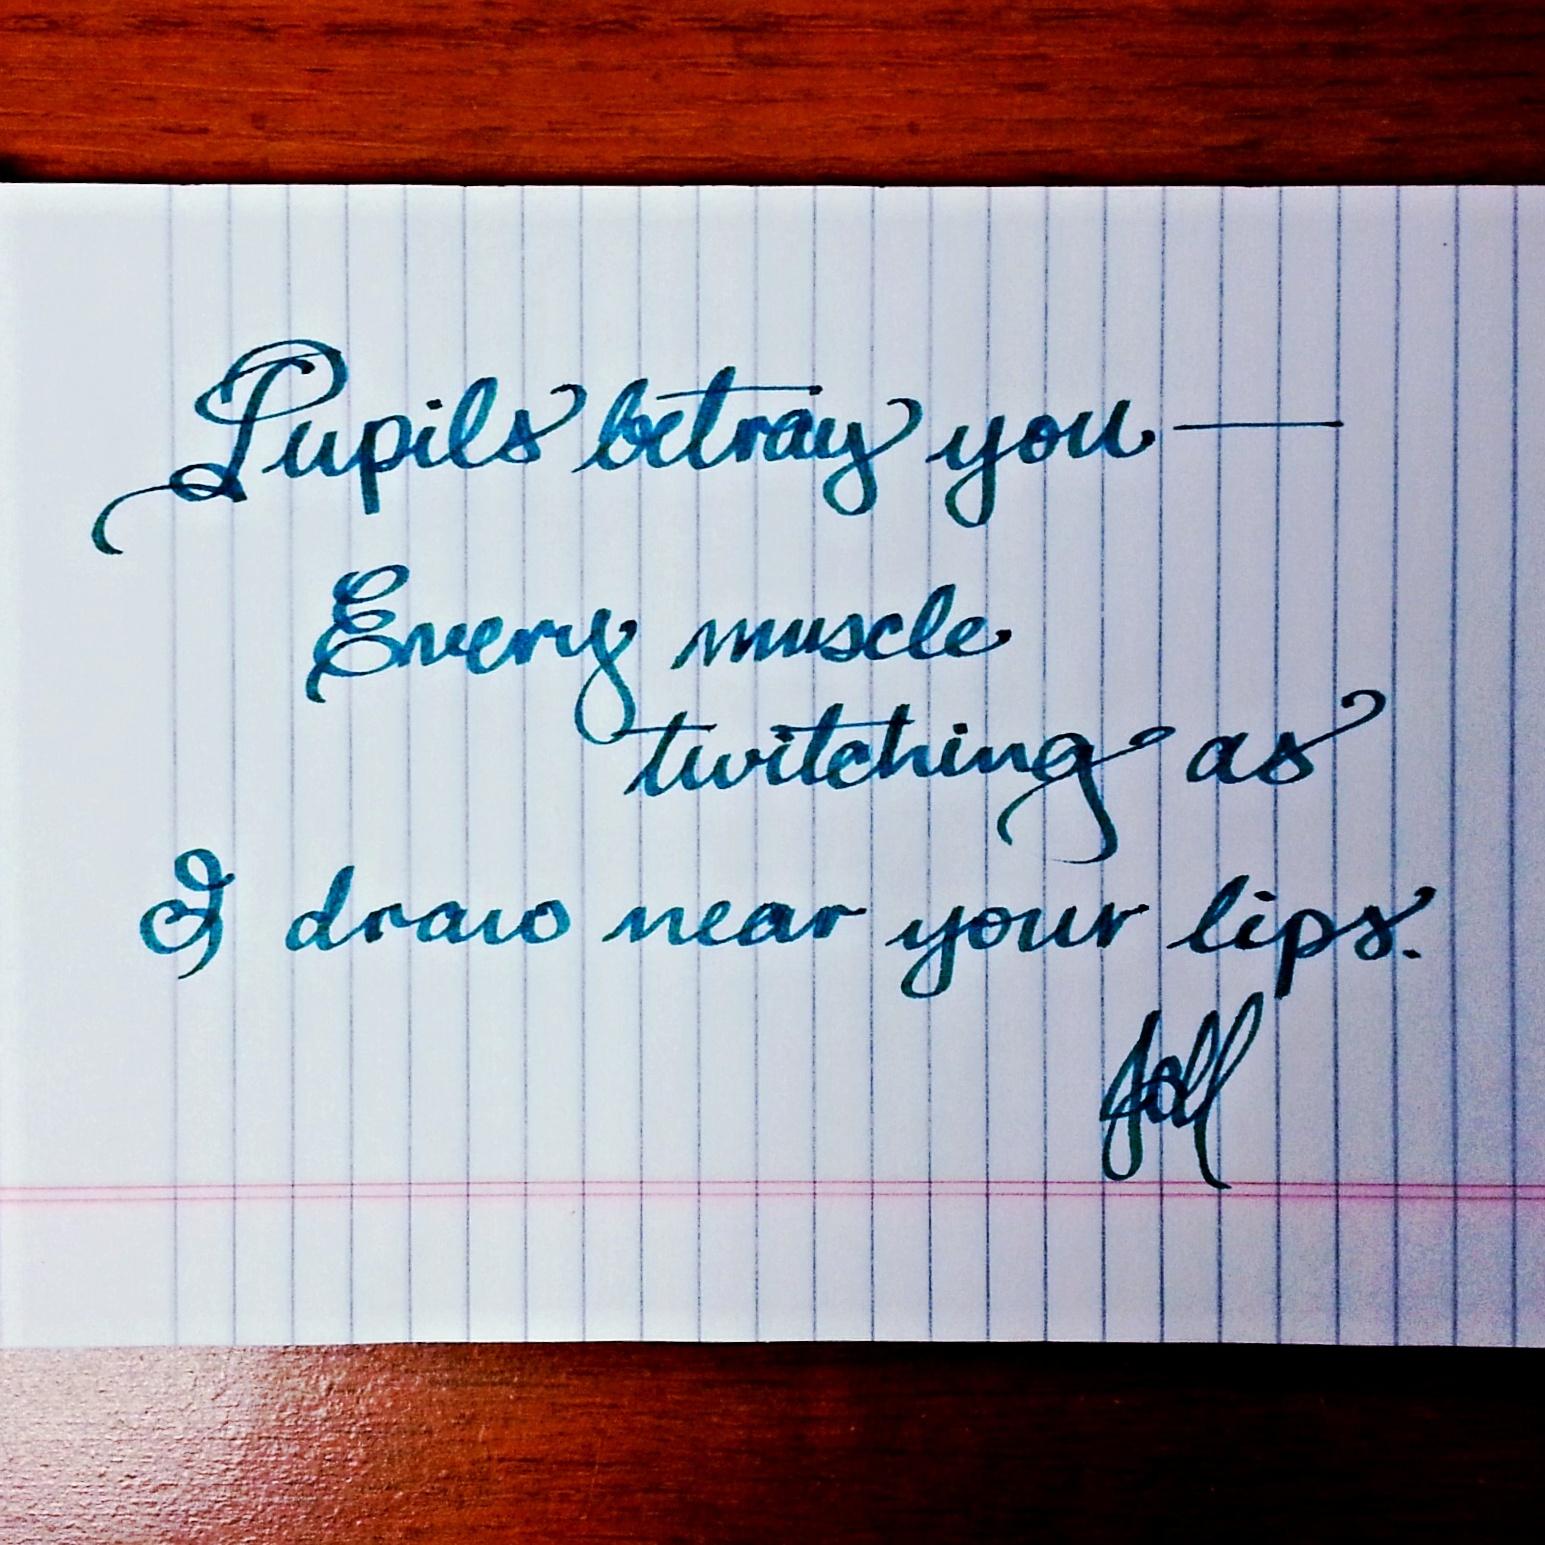 Daily Haiku #67